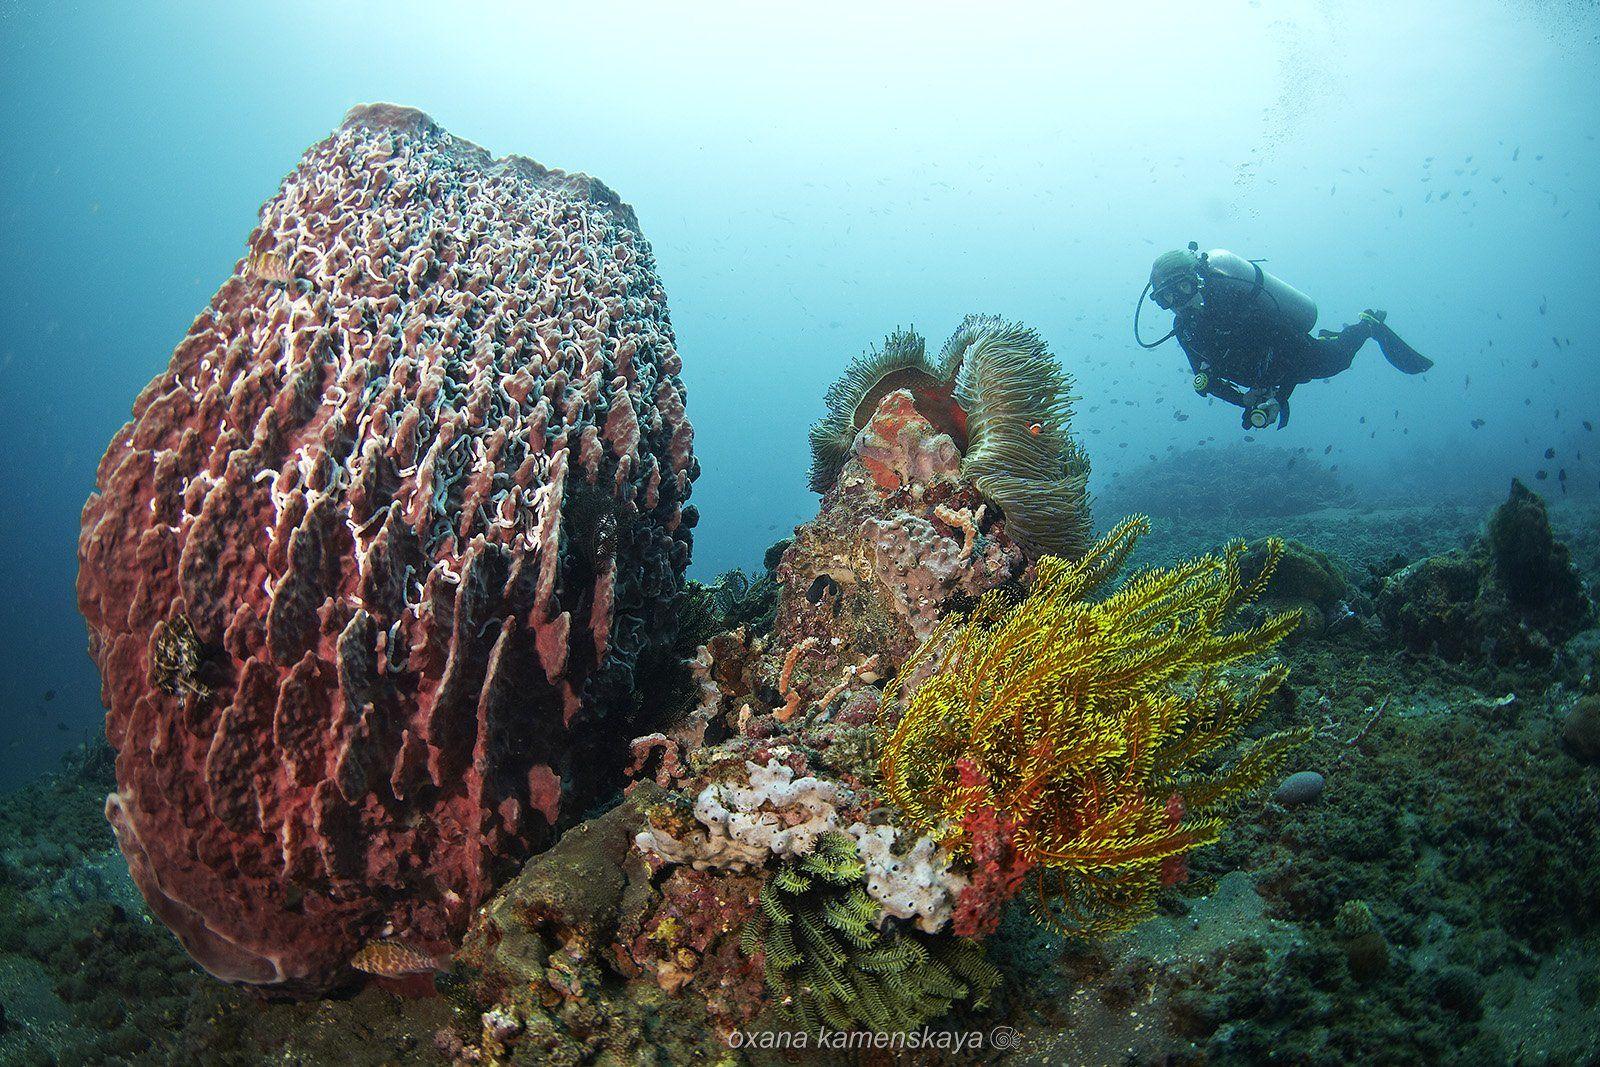 underwater sponge coral anemone diver blue, Оксана Каменская